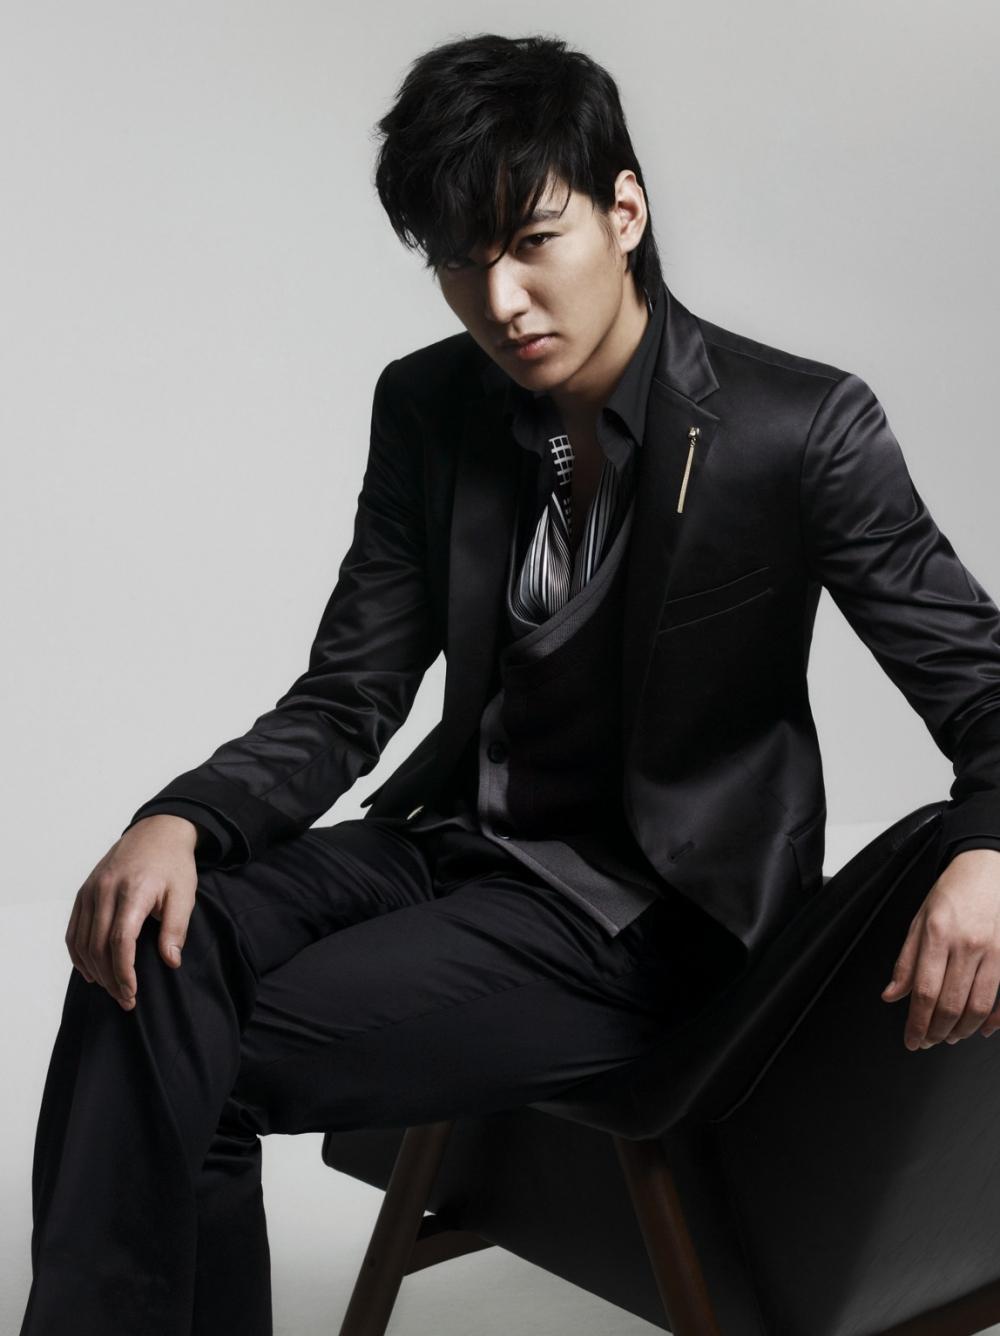 Азия - дорамы & k-pop Kinopoisk.ru-Lee-Min-Ho-1251877